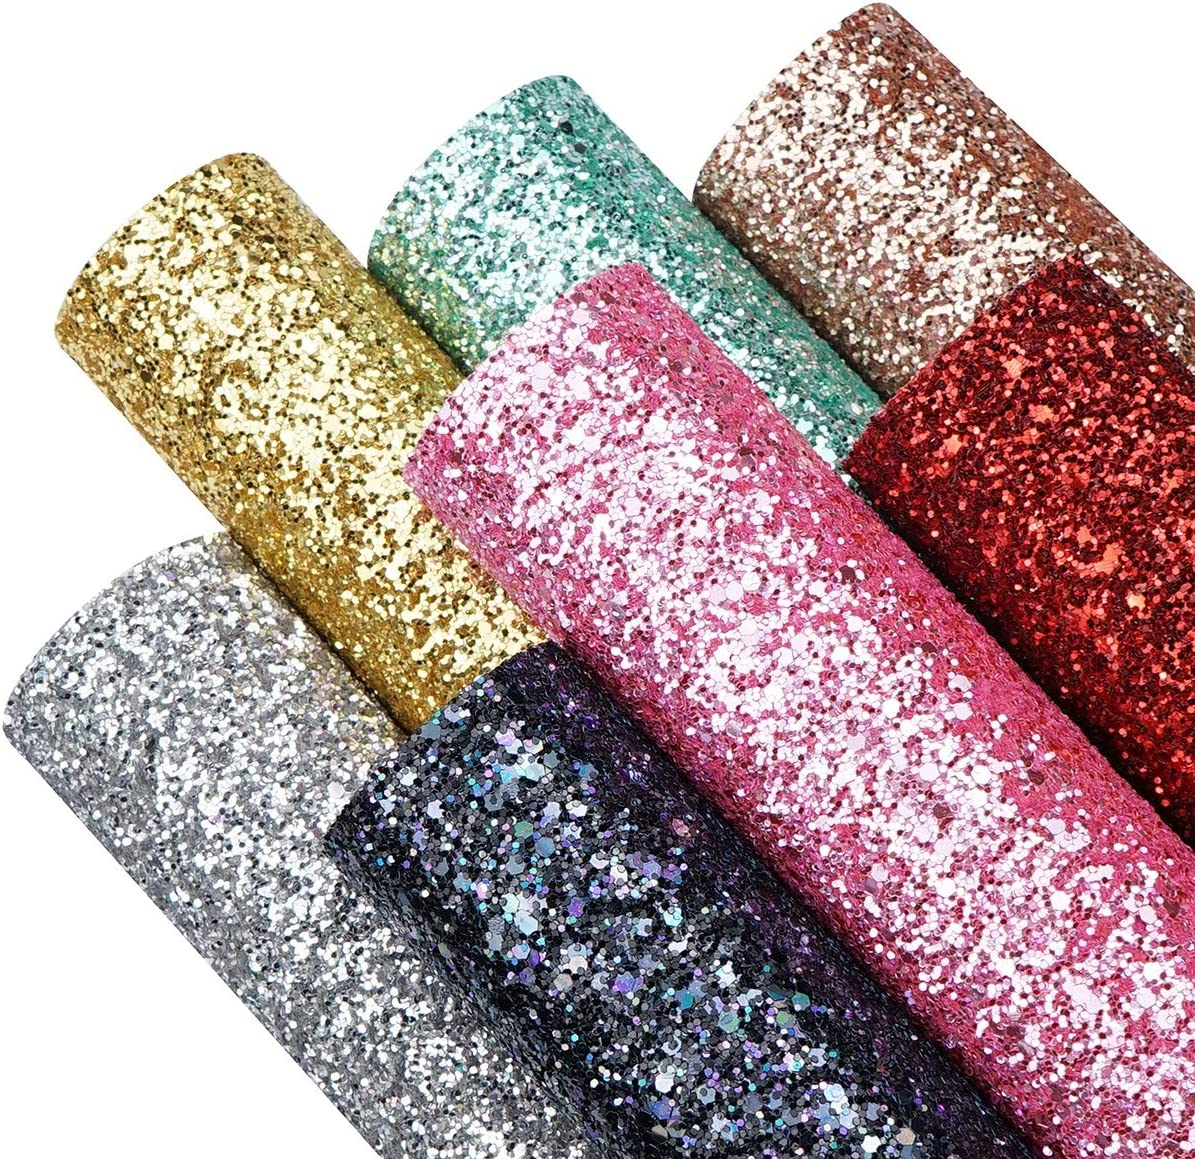 MATTE Fuchsia Chunky Glitter Fabric Sheet-Faux Leather Sheet-Glitter Fabric Sheet-A4 or A5 Glitter Fabric Leather-DIY Hair Bows 1mm Thick